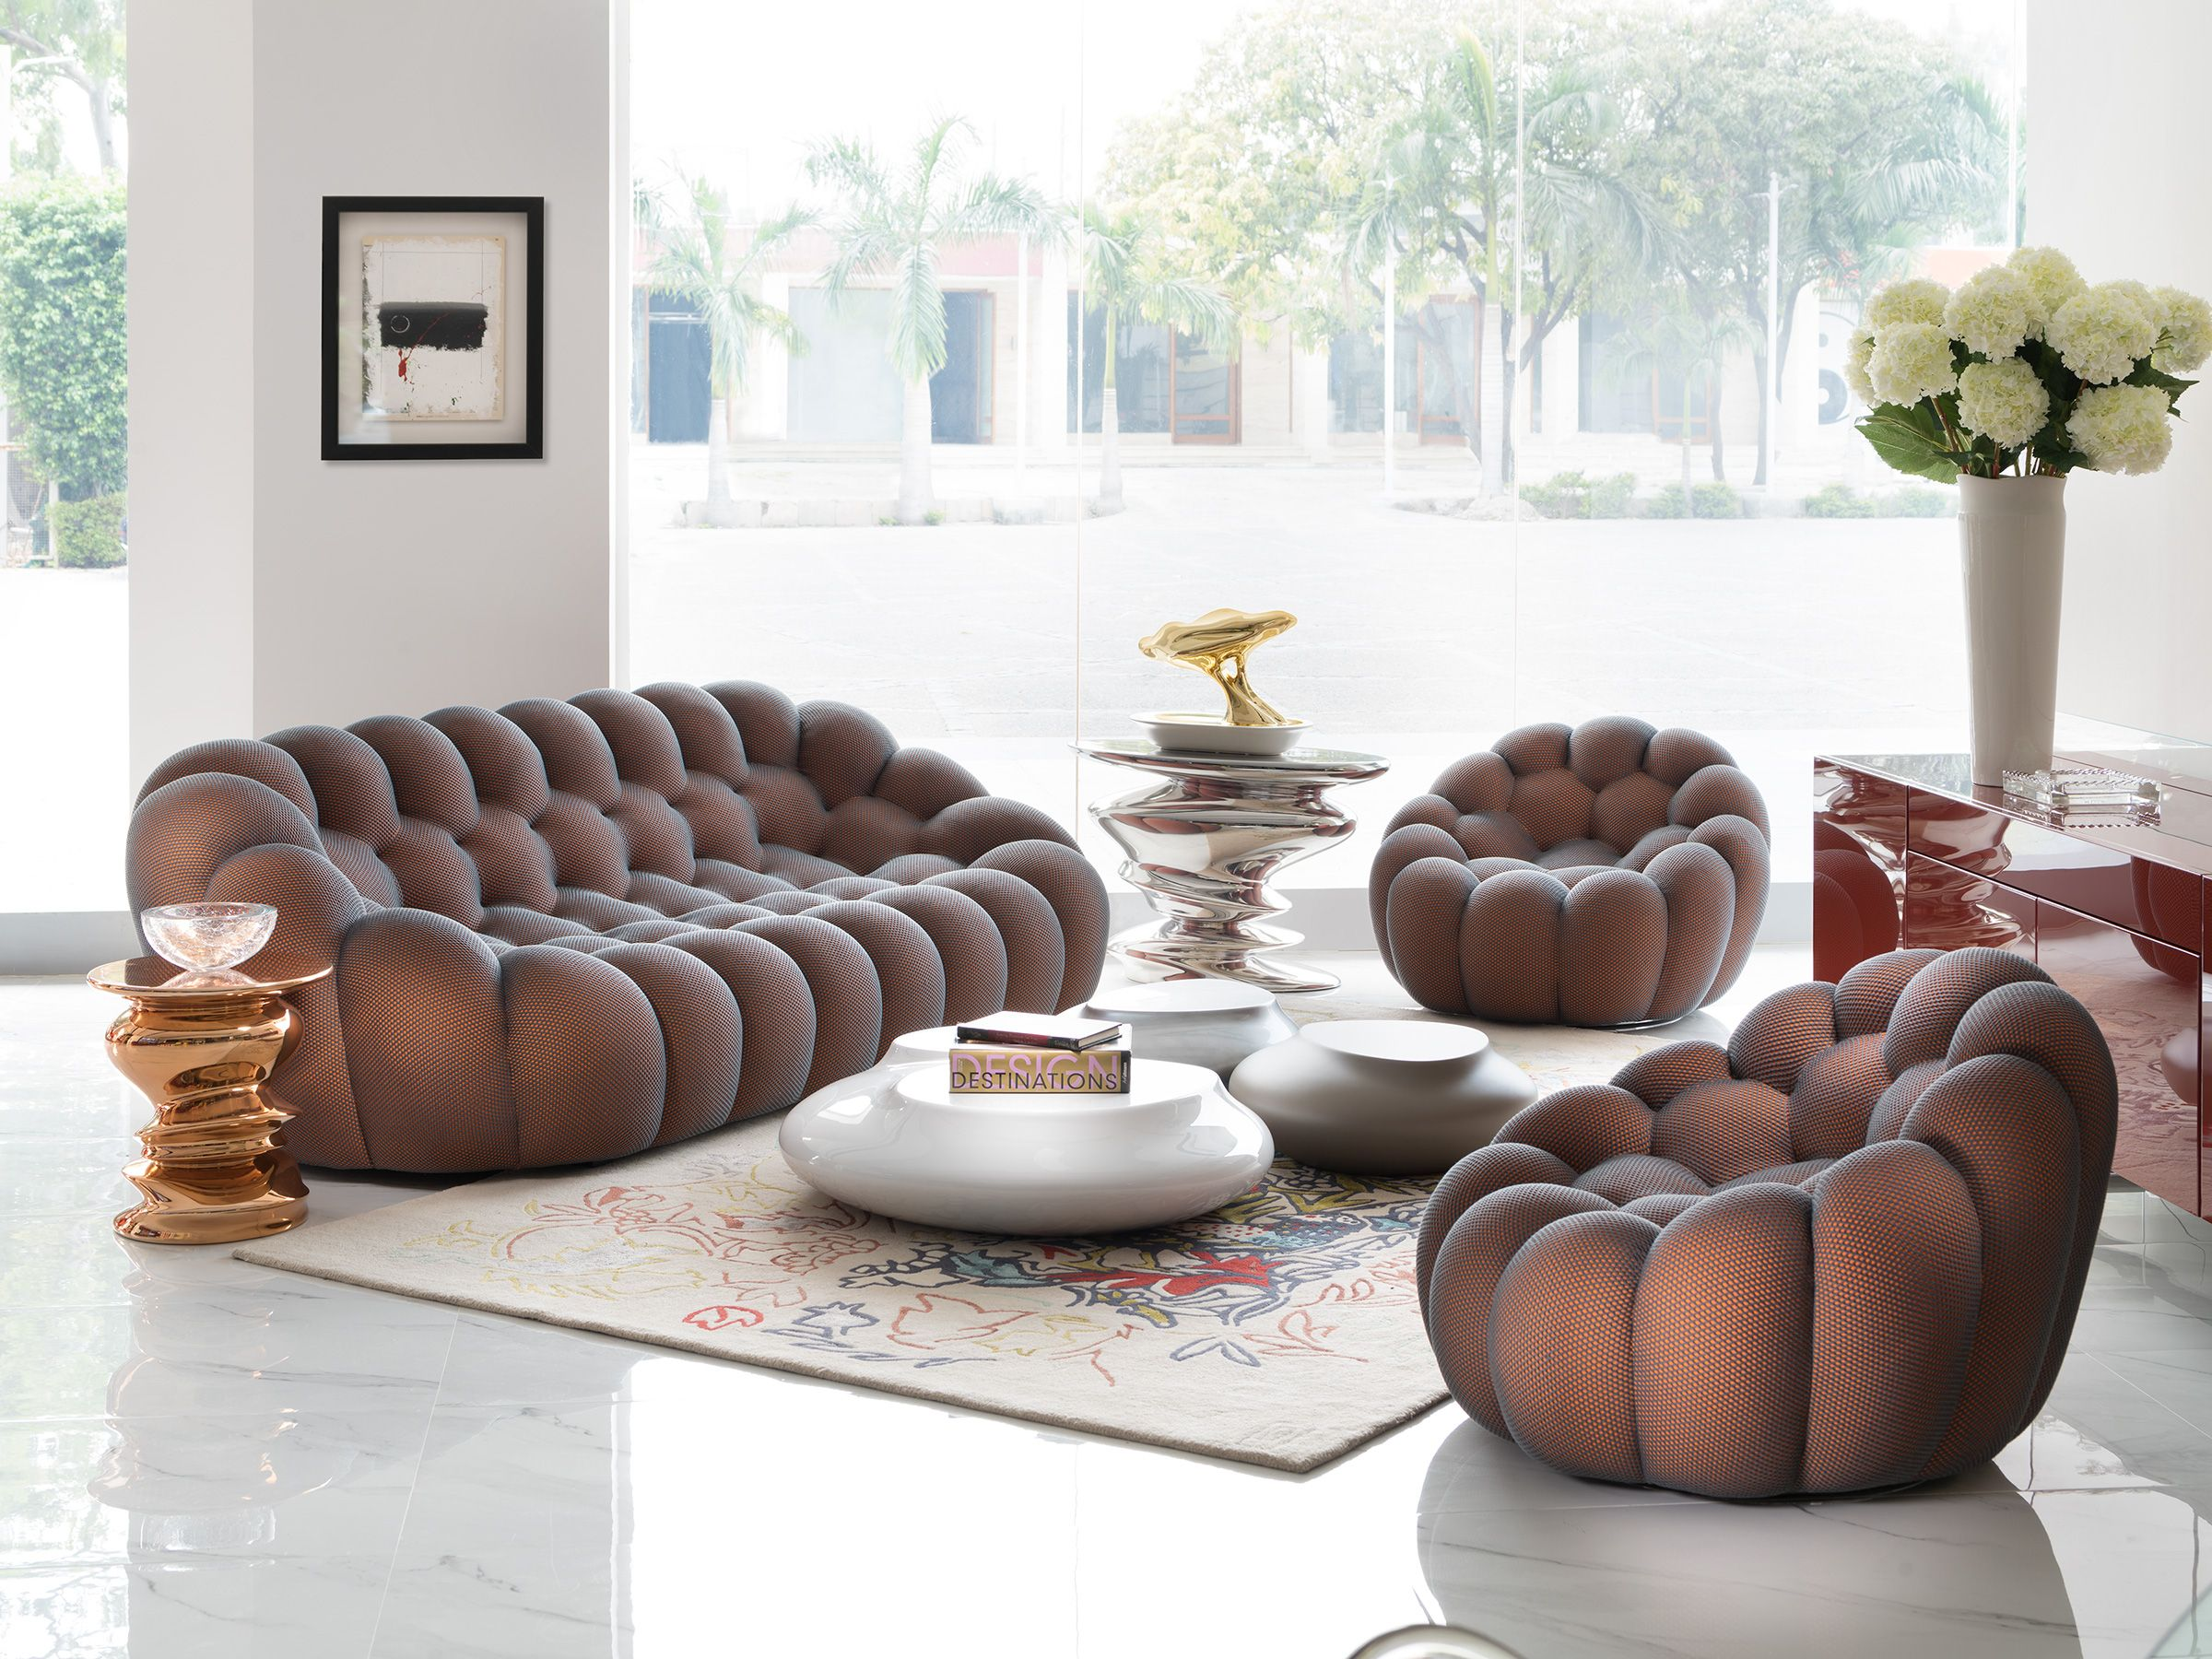 bubble sofa sacha lakic longhorn bed roche bobois new delhi india showroom